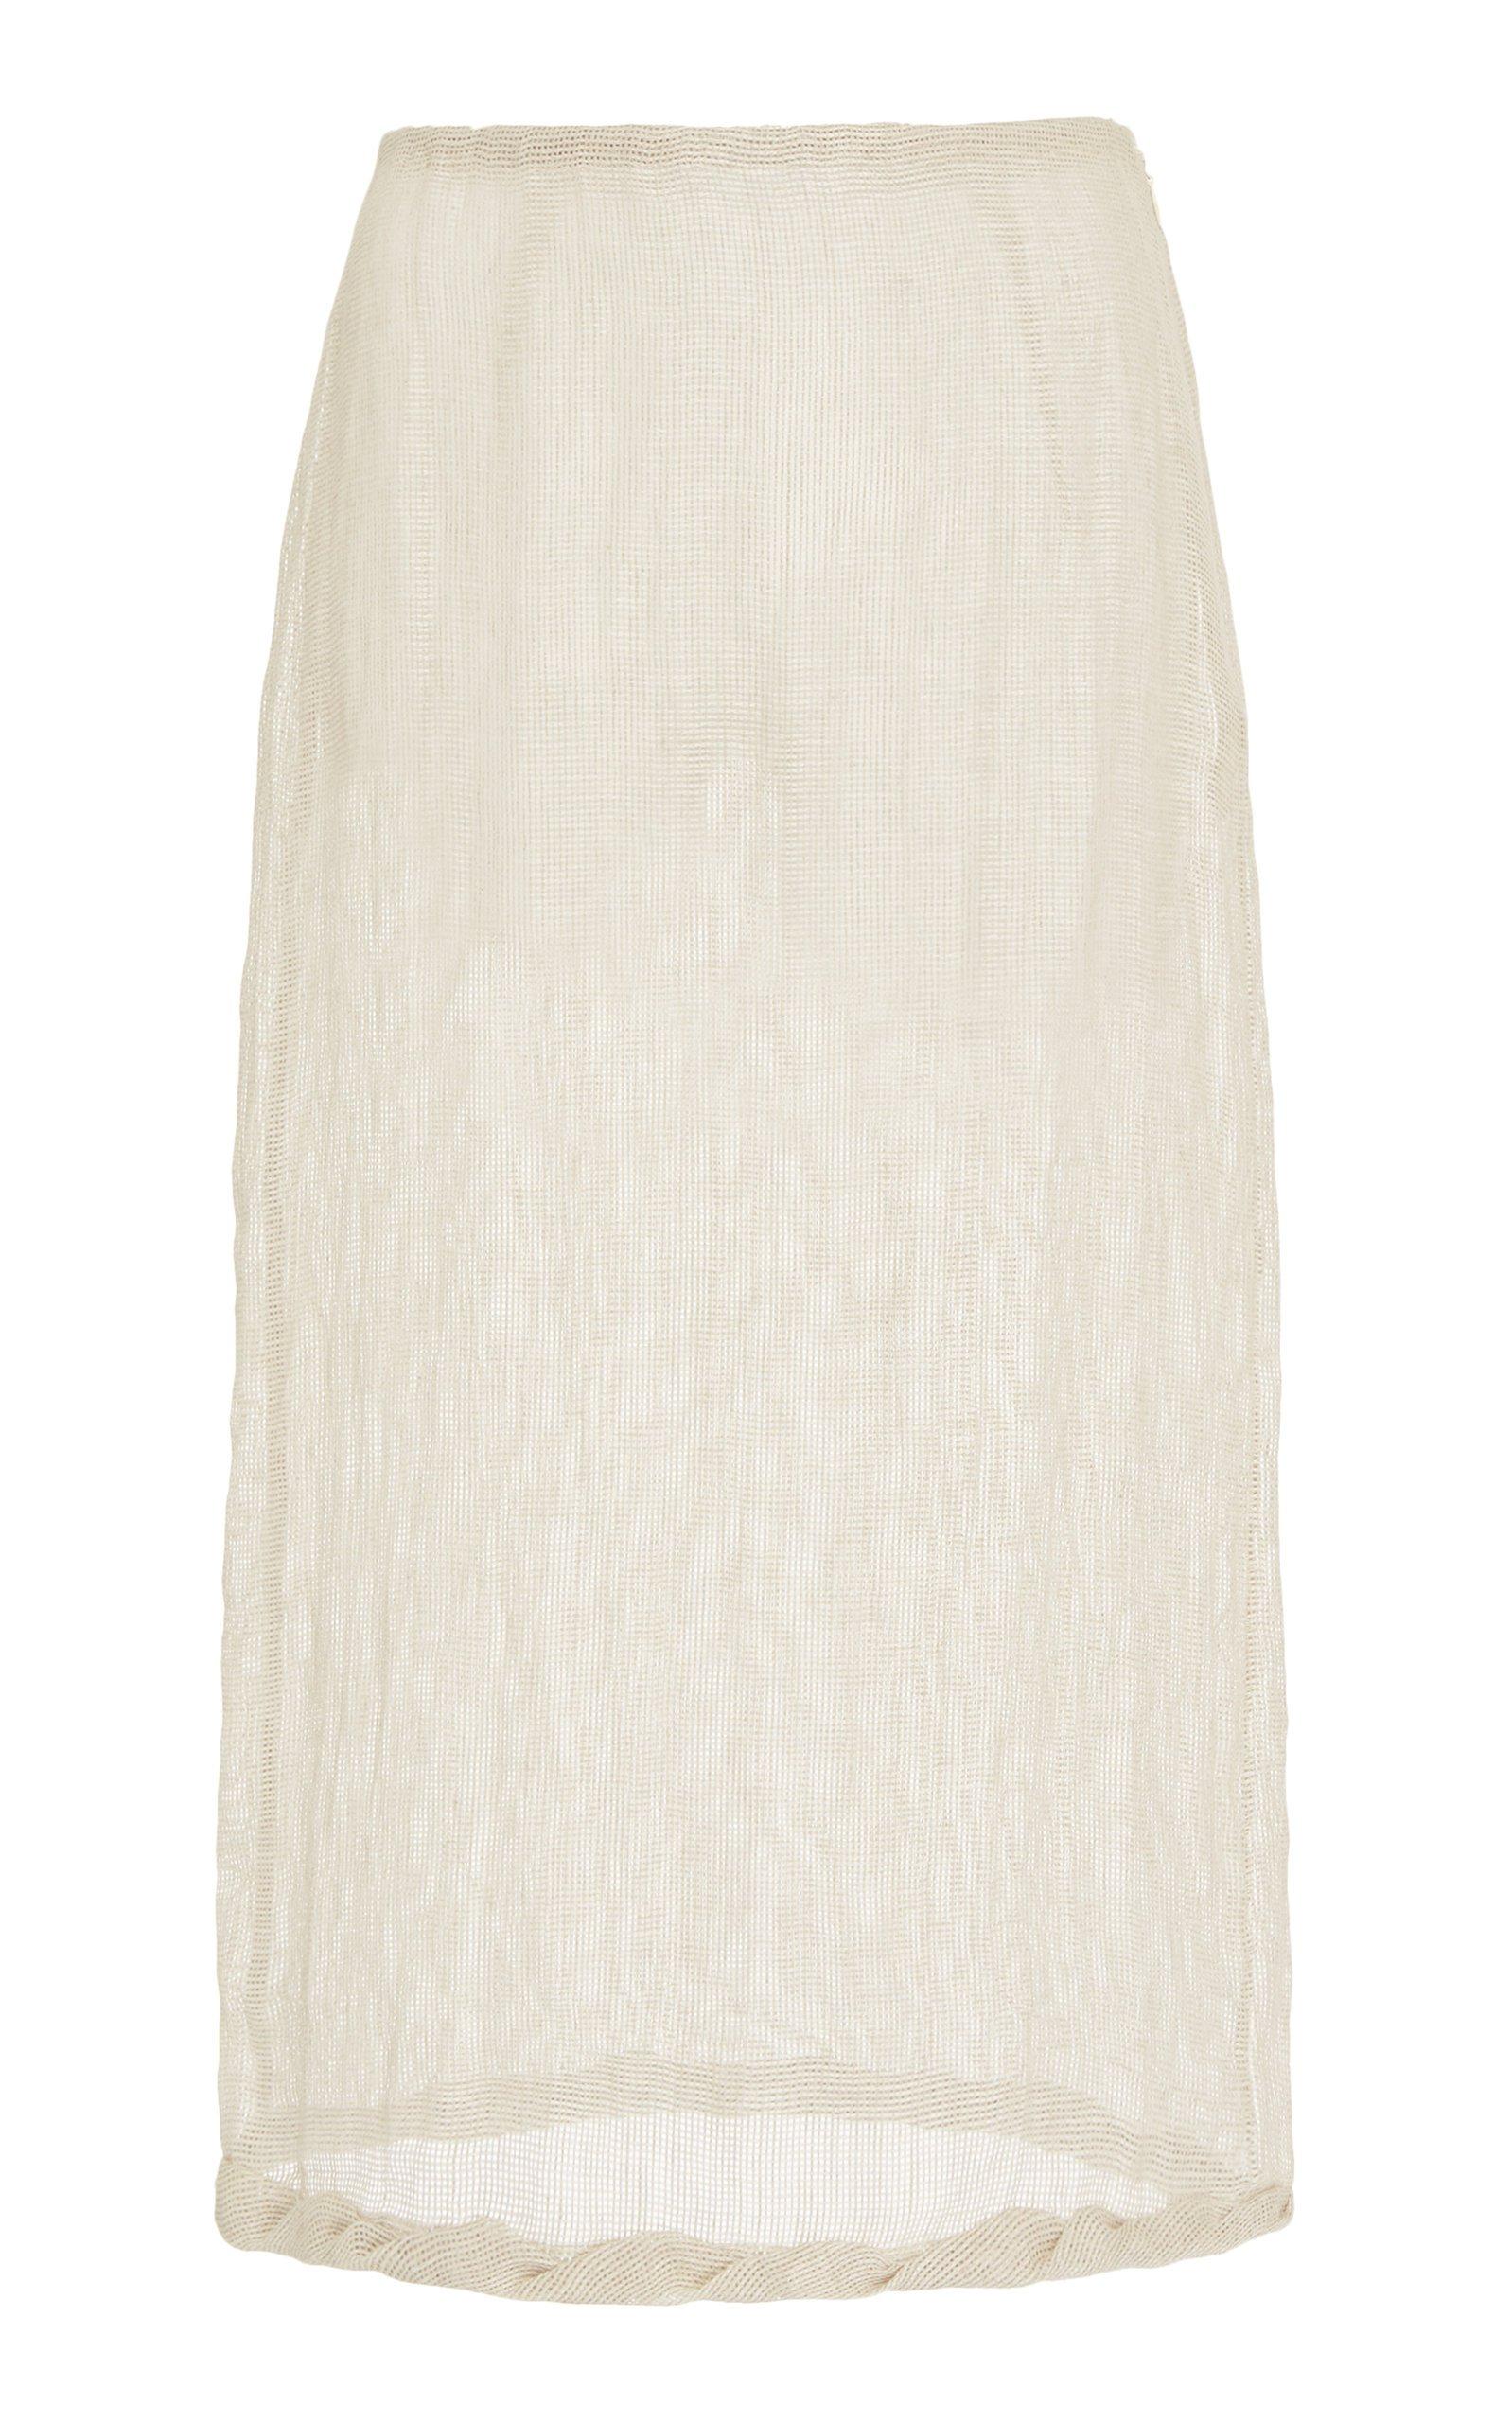 Rejina Pyo Dani Linen Voile Pencil Skirt Size: 12